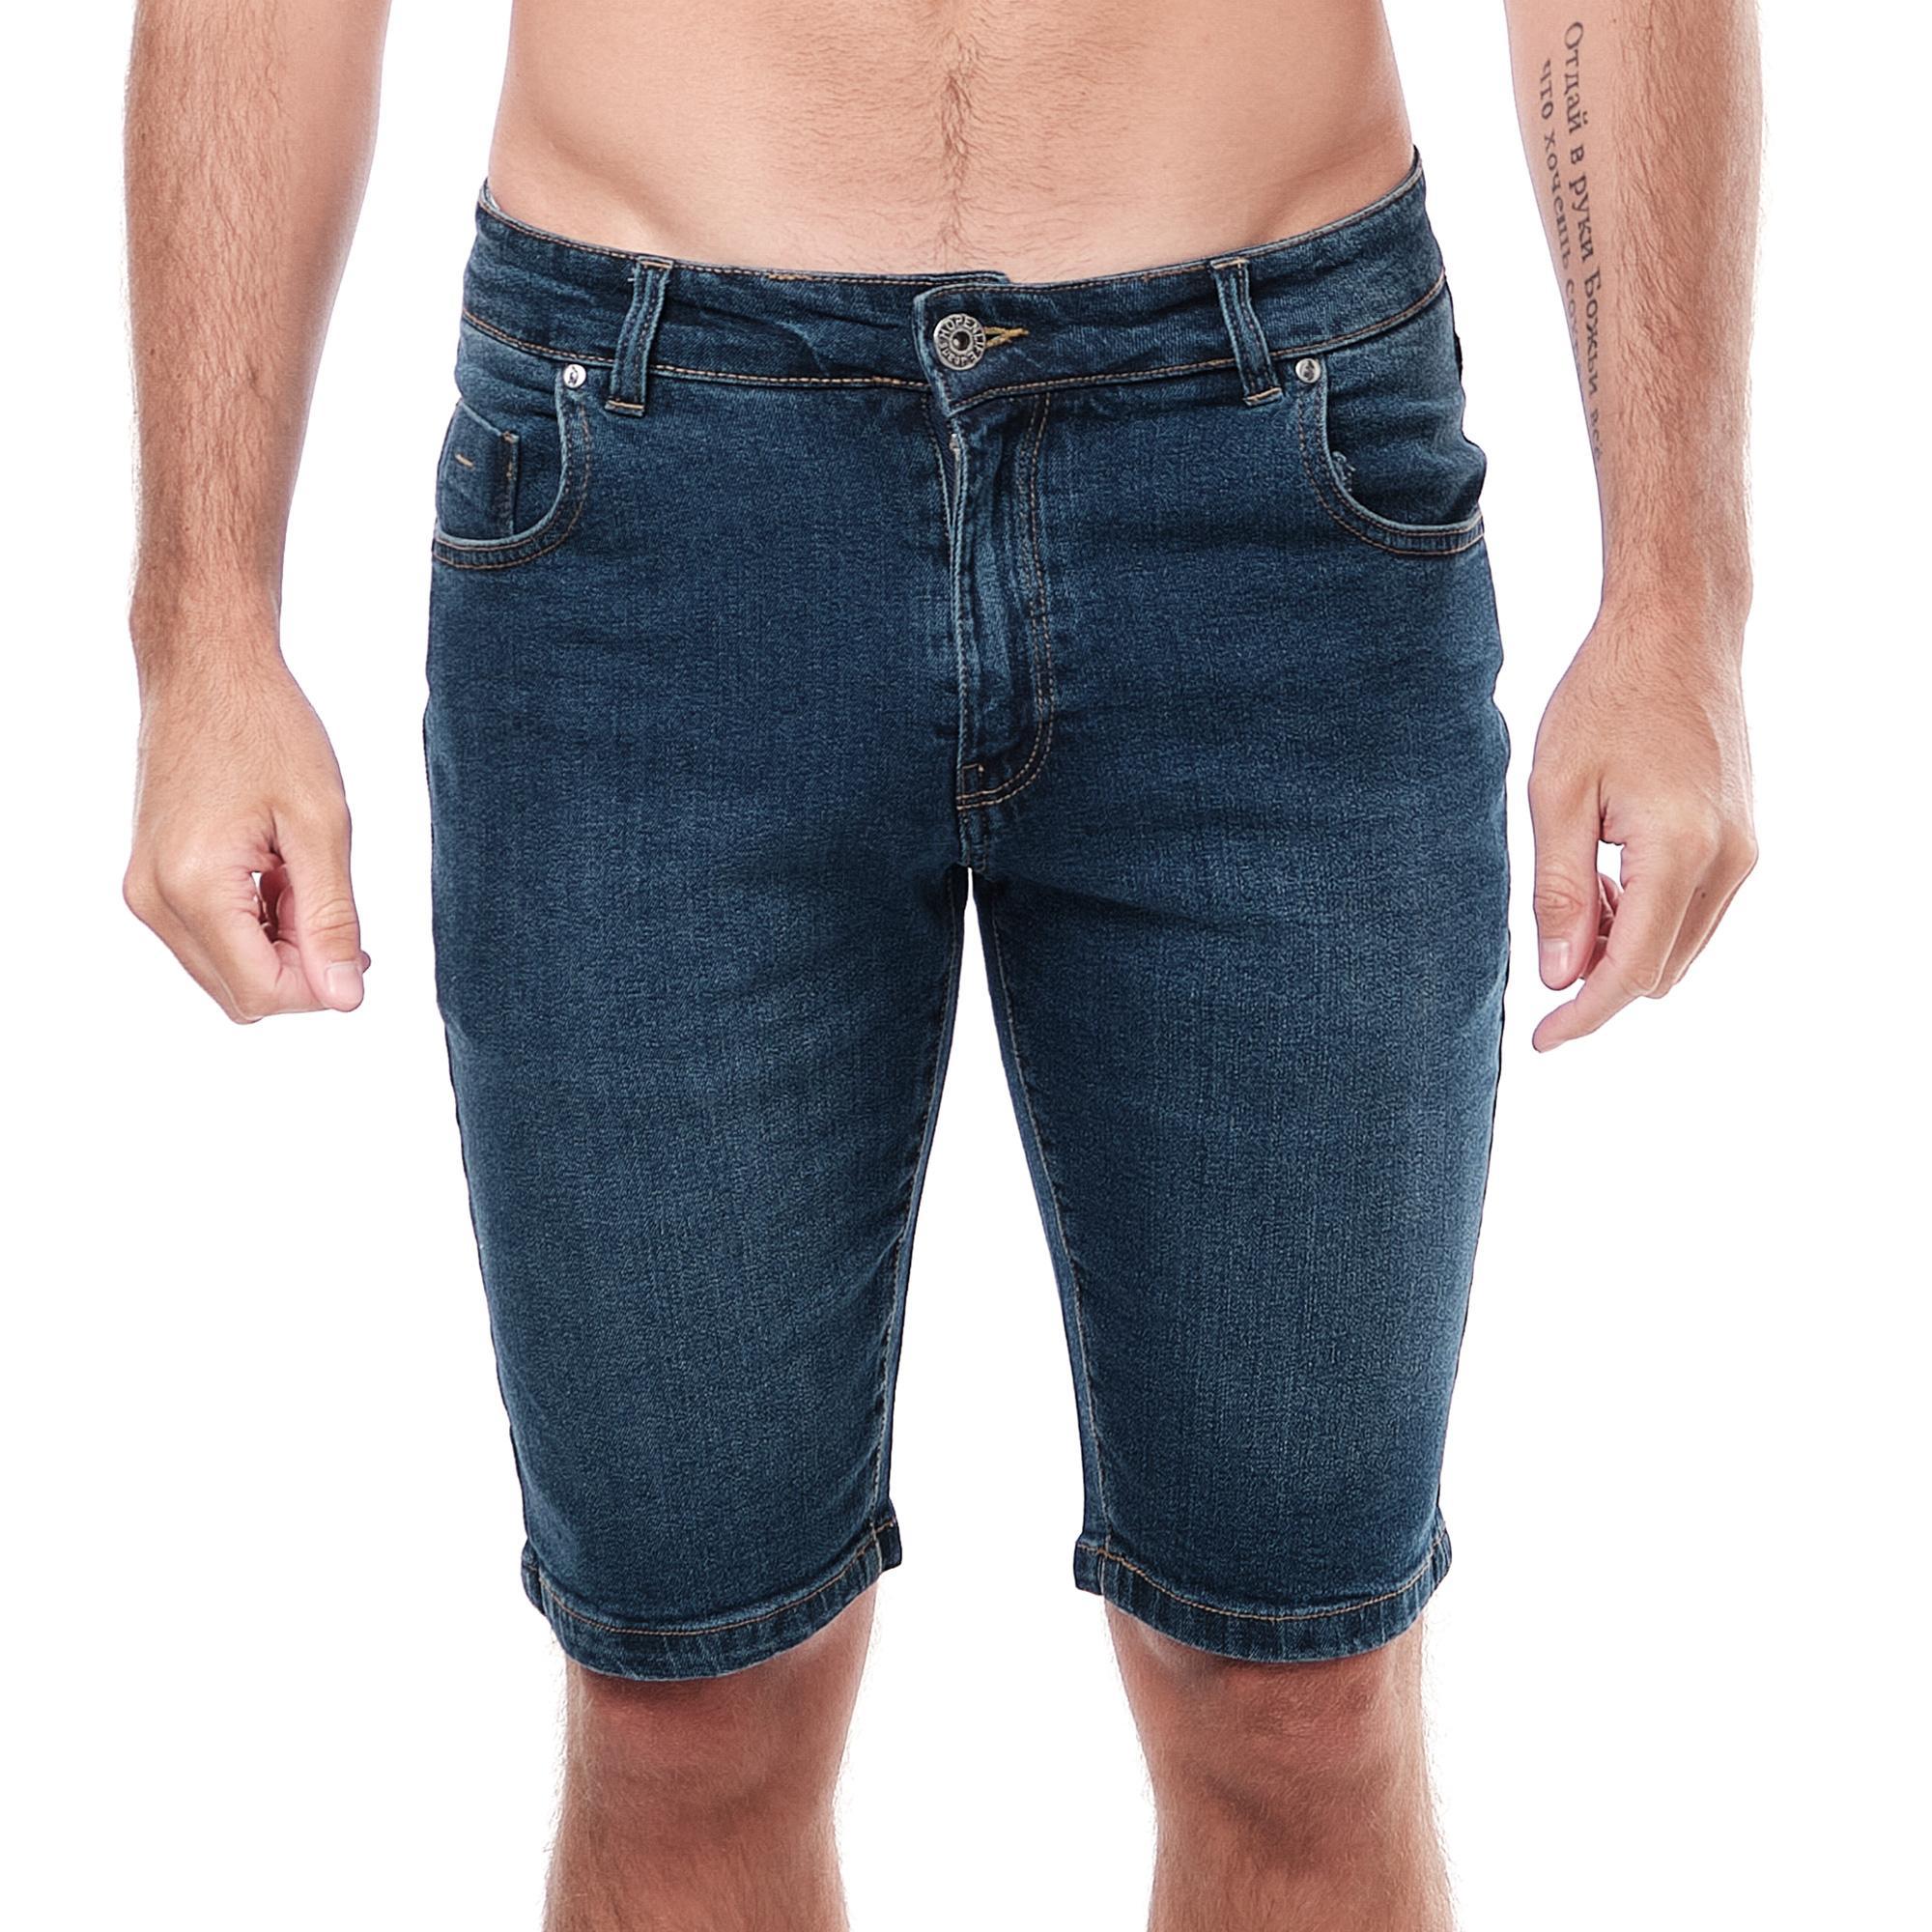 Shorts Uomo Blue Hopenlife DONALD-BLEU #c eFashion Paris